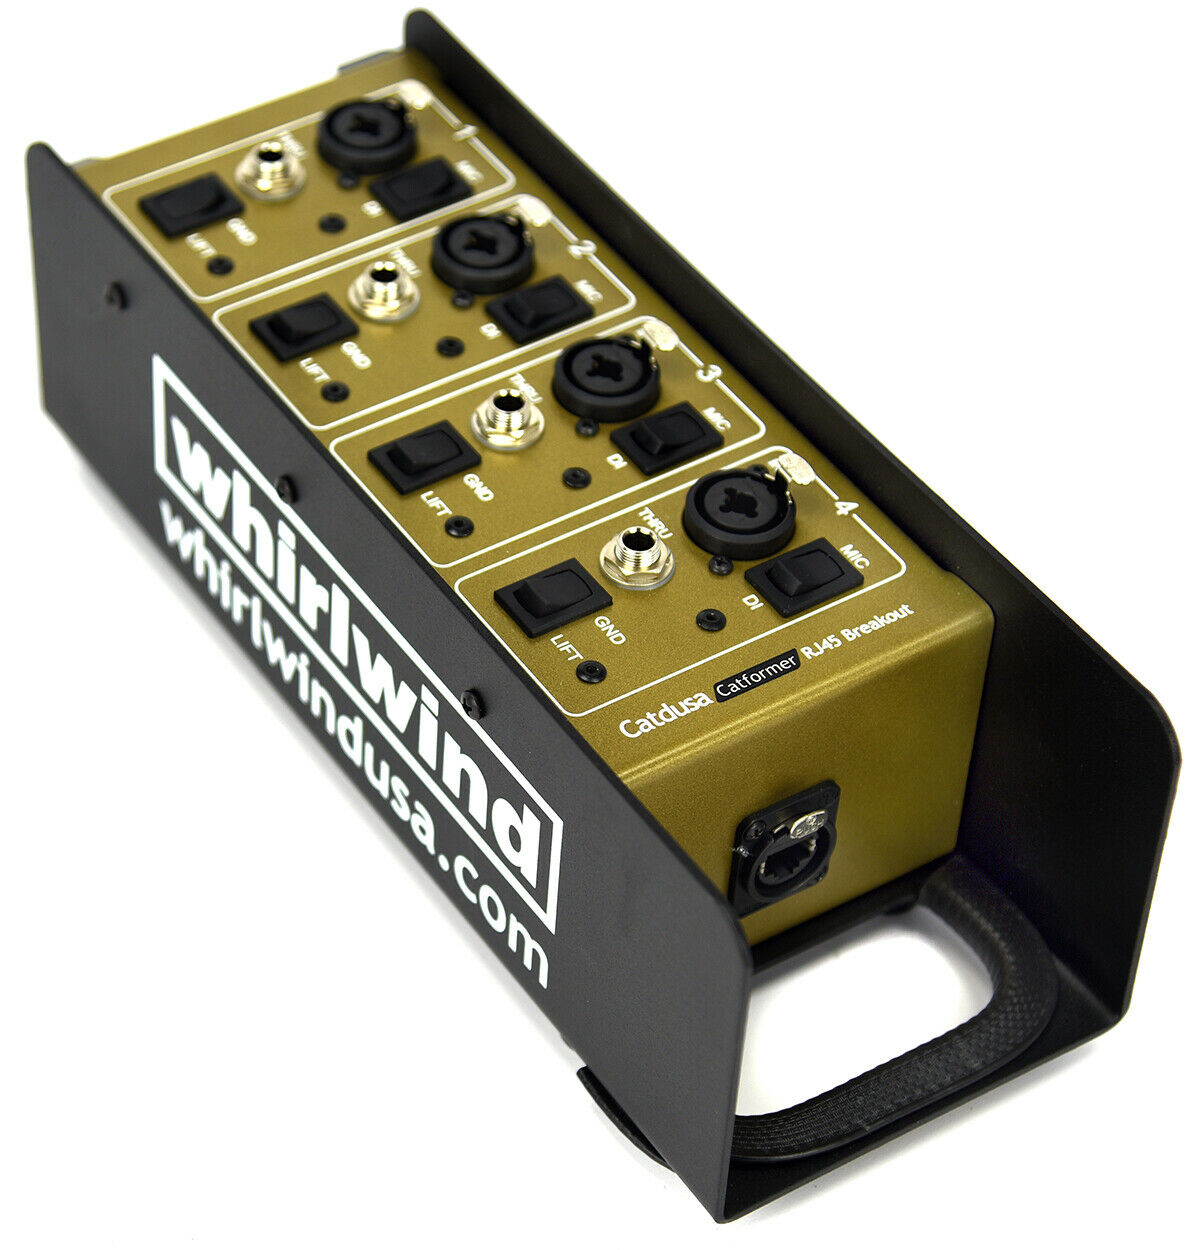 Image 1 - Whirlwind Catformer 4 channel RJ45 breakout Box Combo XLR/DI to Neutrik Ethercon